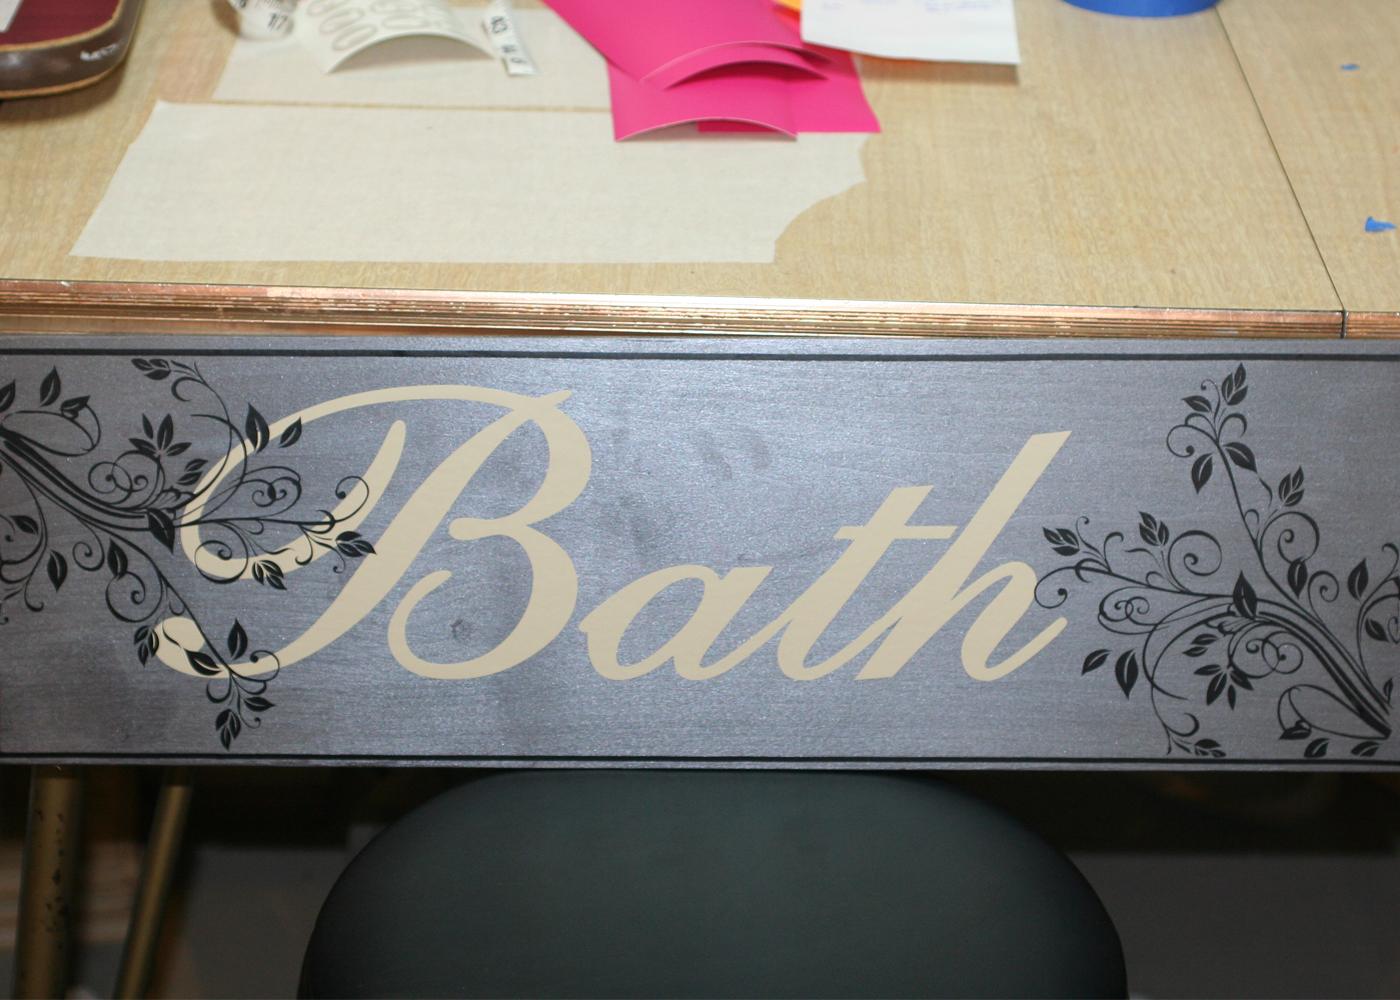 bath-vinyl-decal-lettering-with-scrolls-on-board.jpg